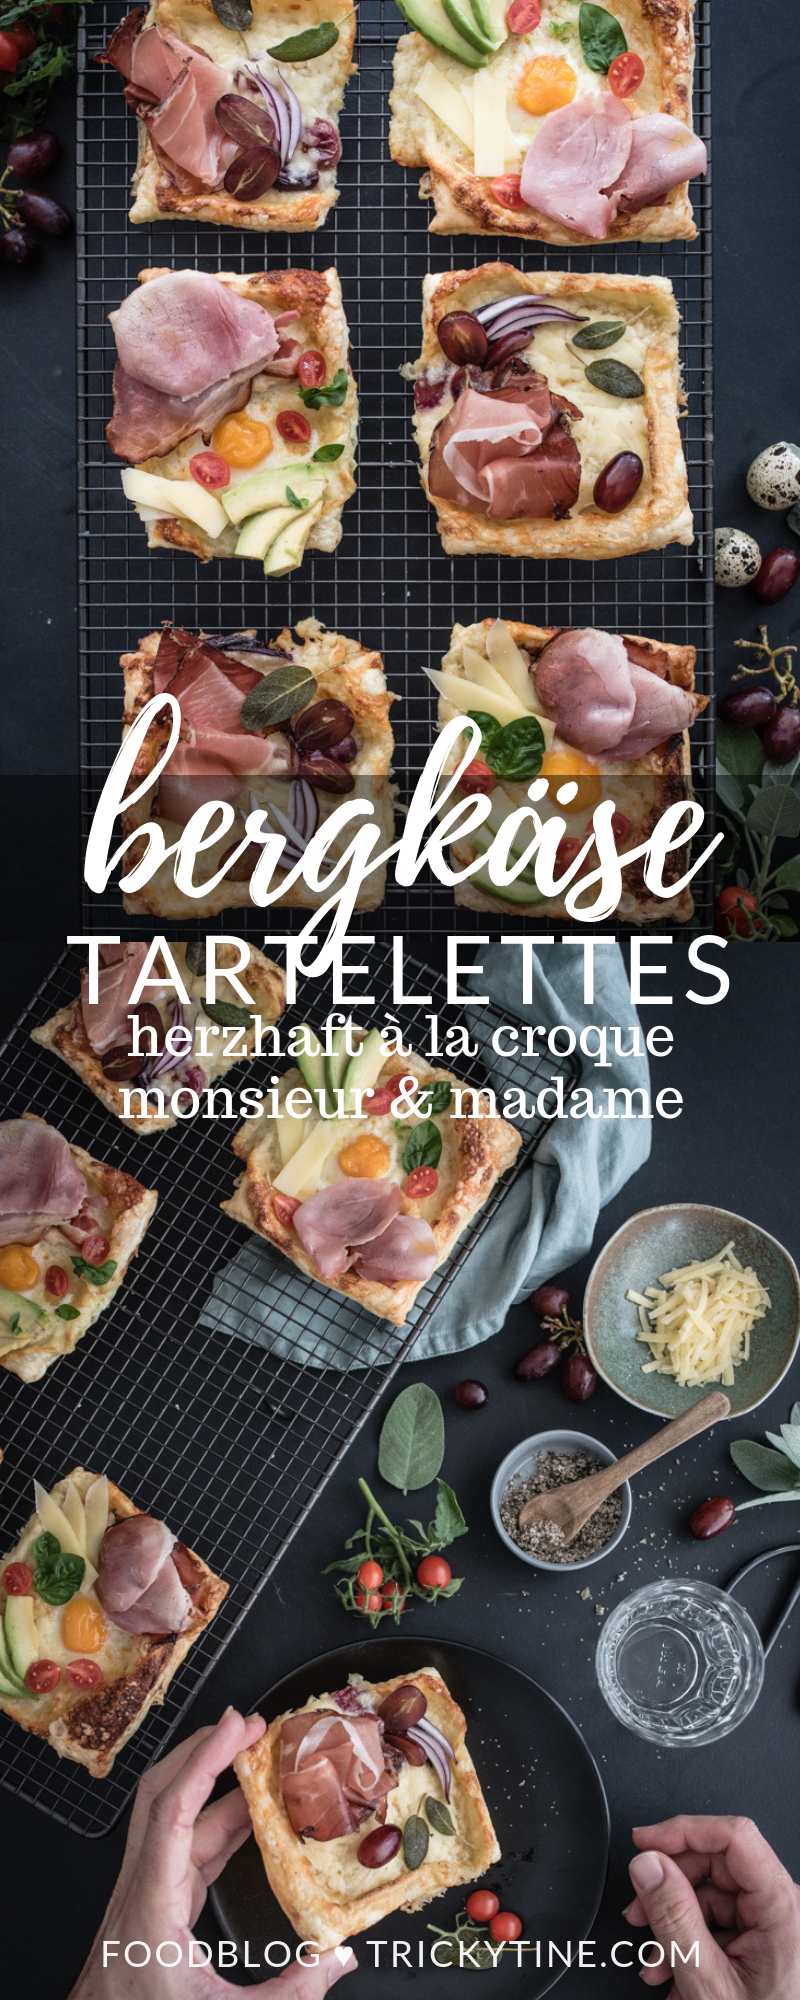 bergkaese croque monsieur madame trickytine rezept